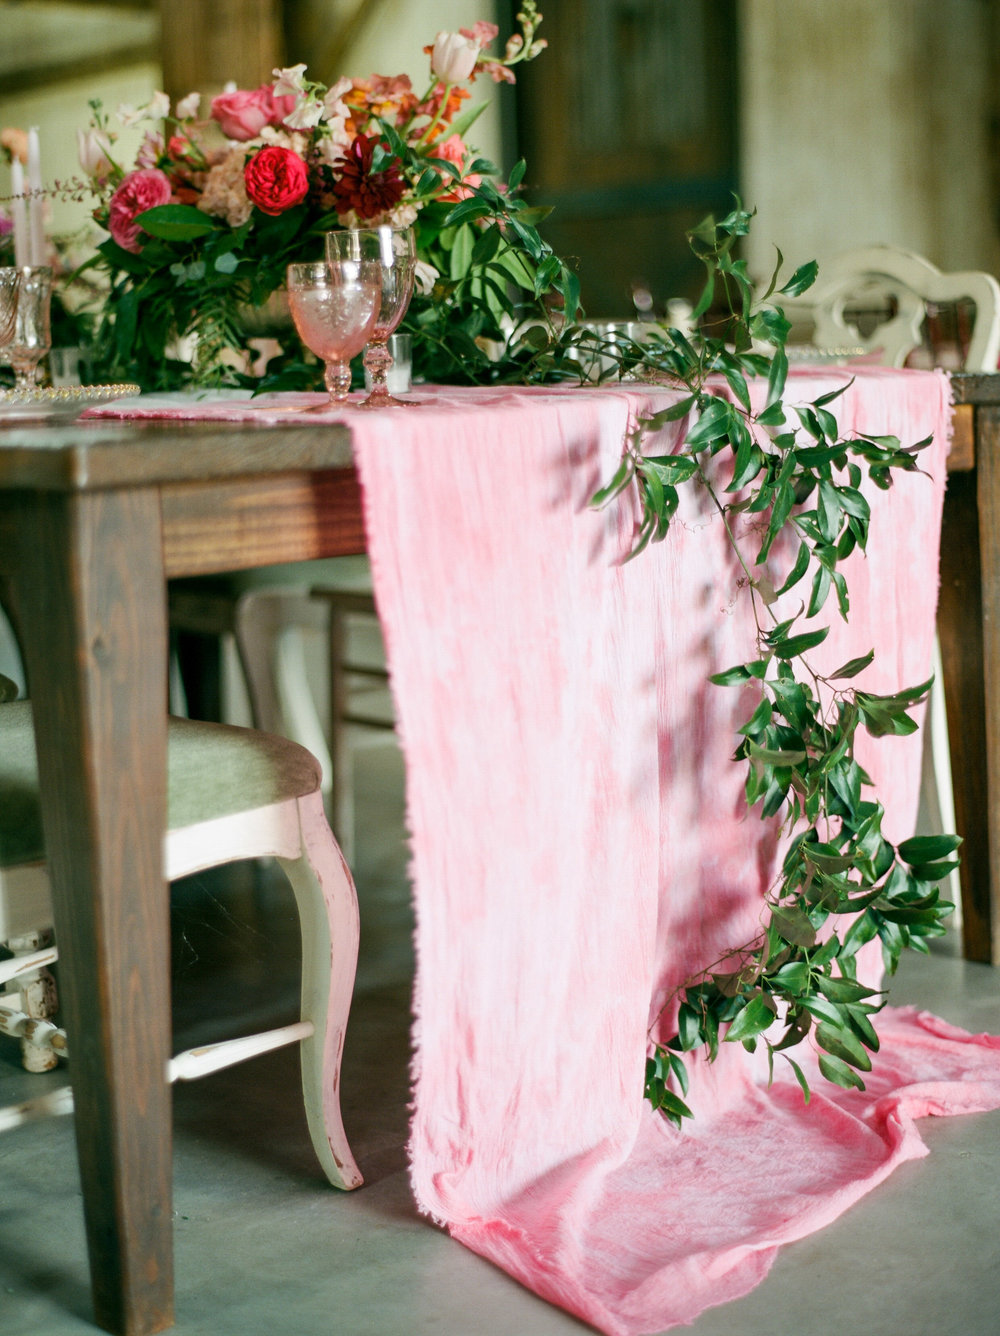 The-Knot-50-Weddings-50-States-Texas-Winner-Dana-Fernandez-photography-houston-wedding-photographer-film-fine-art-destination-40.jpg